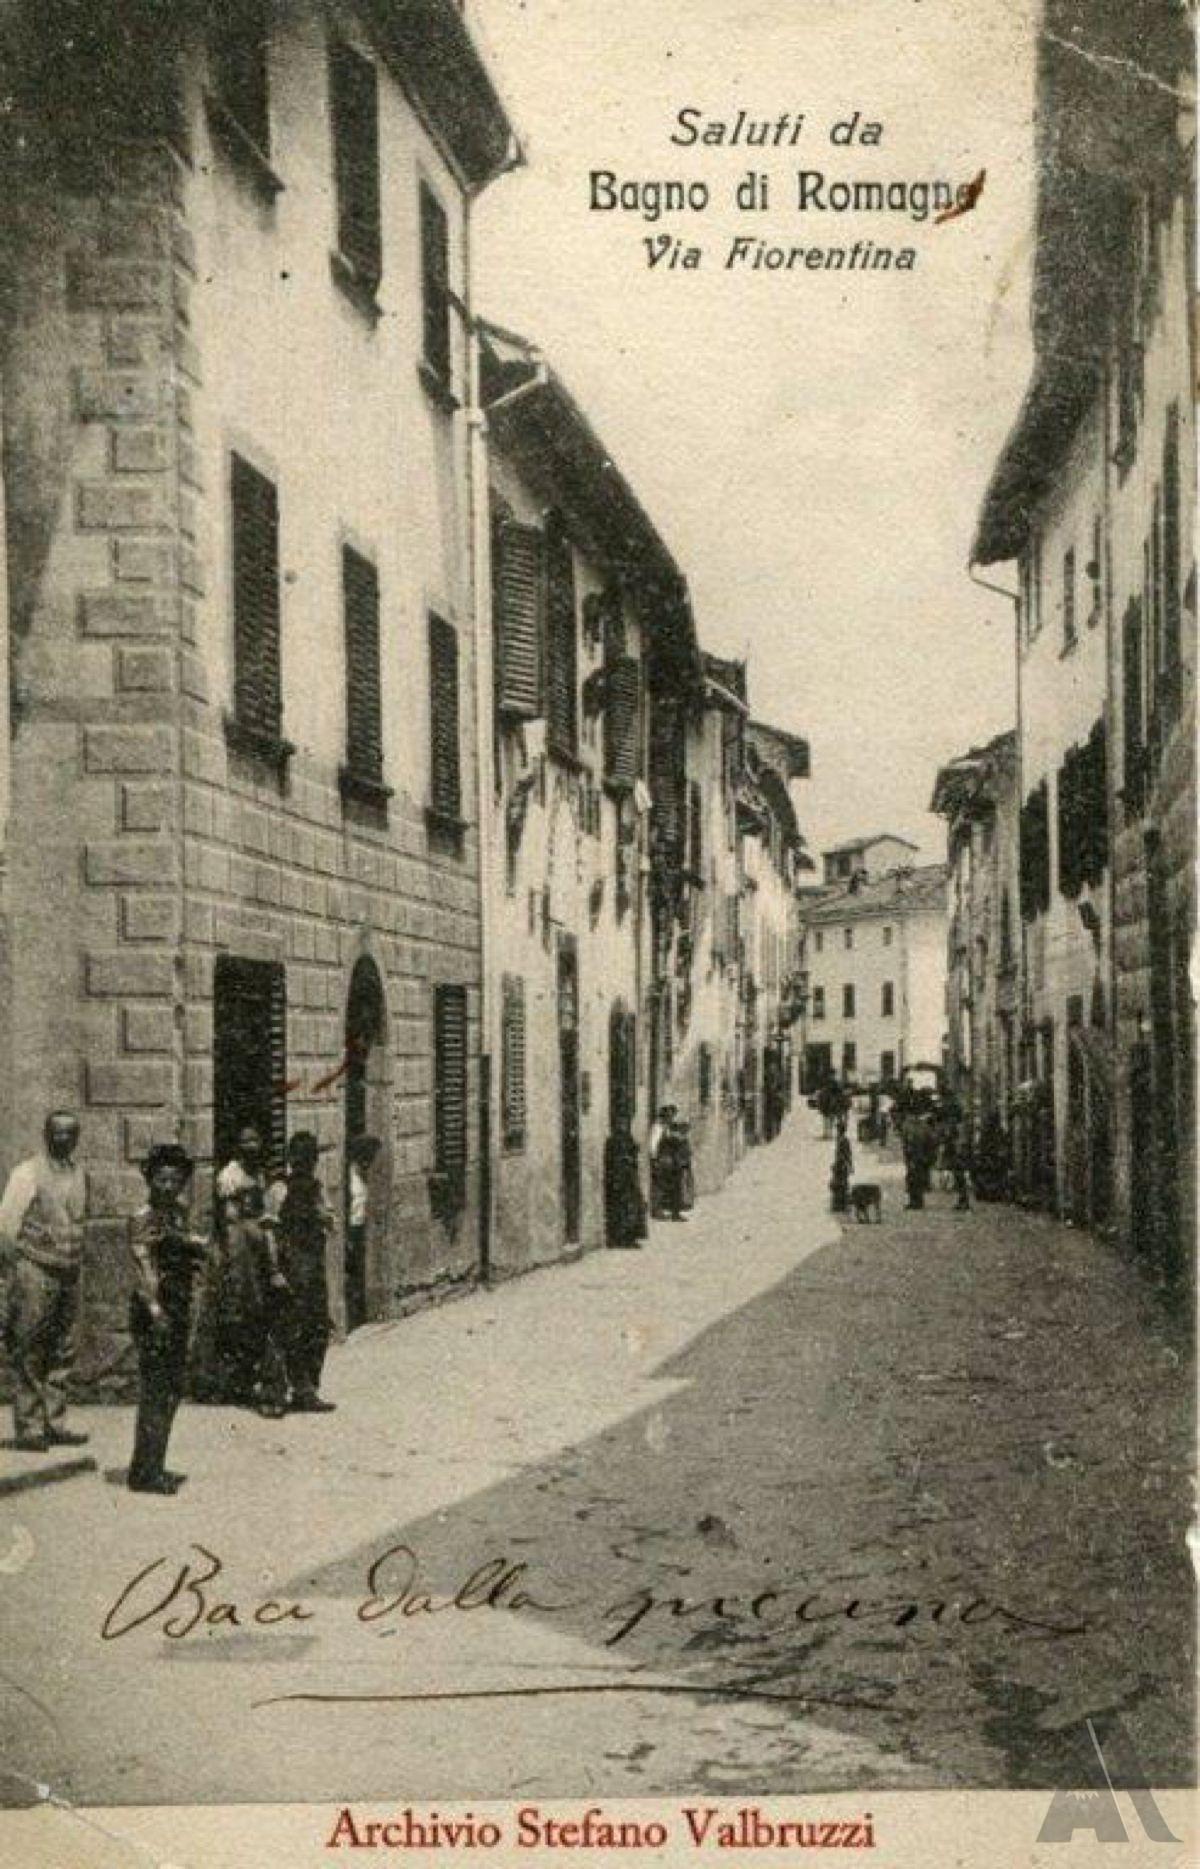 Cartolina – B/N opaco, cm 14x9. Viaggiata – Da Bagno per Cesena, 01/11/1909. Francobollo – Effige Vitt. Em. III volta a sinistra, C. 5, colore verde. Timbro – Tondo riquadrato.